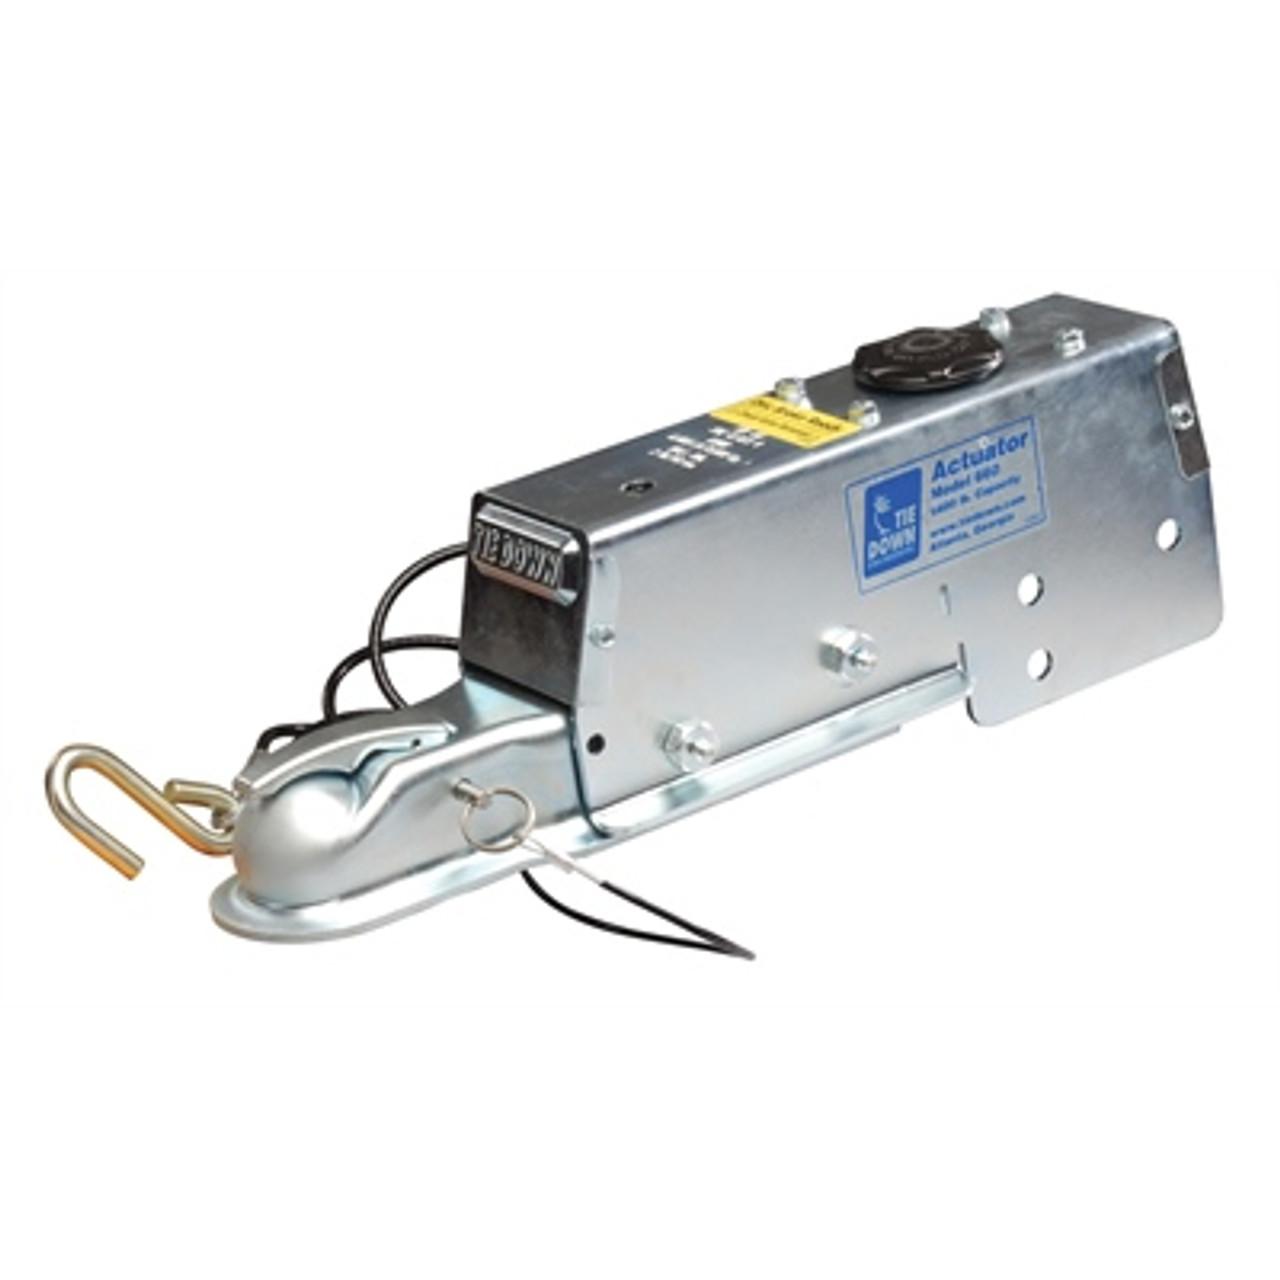 brake coupler tie down engineering model 660 actuator at champion trailers [ 1280 x 1280 Pixel ]